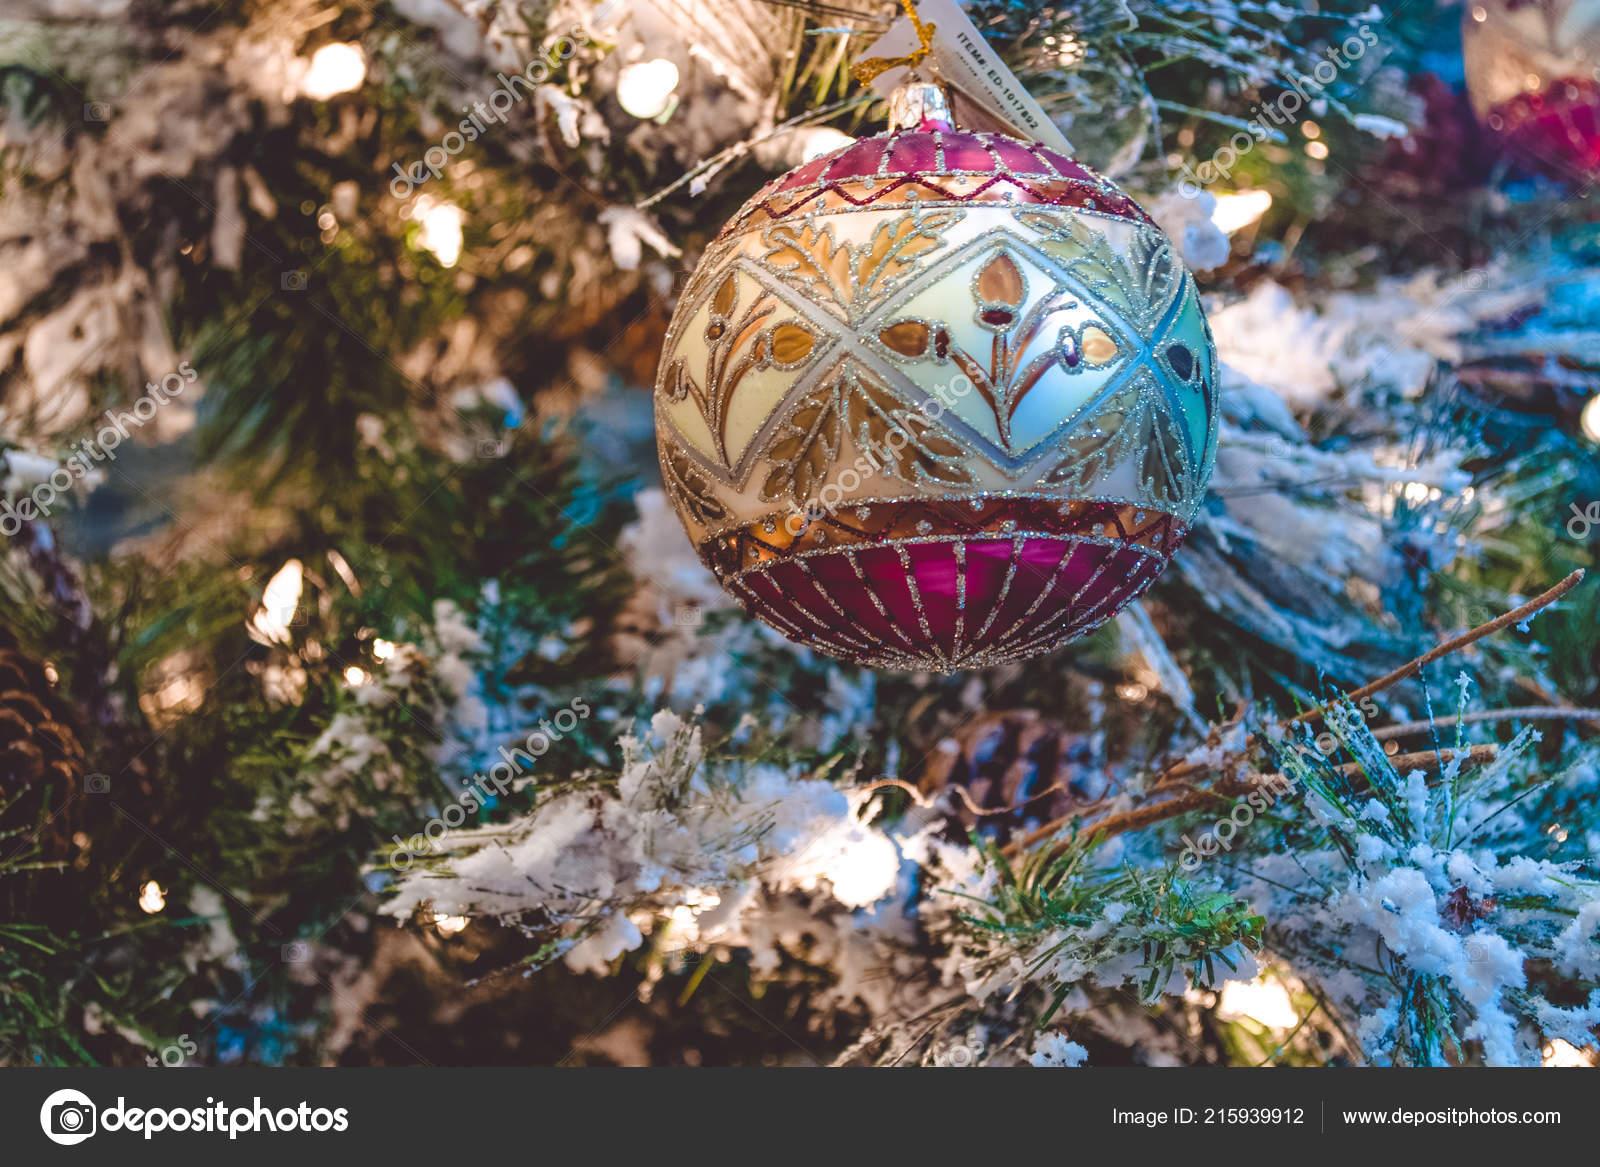 Addobbi Natalizi Luci.Natale Buon Natale Nuovo Anno 2019 Addobbi Natalizi Giocattoli